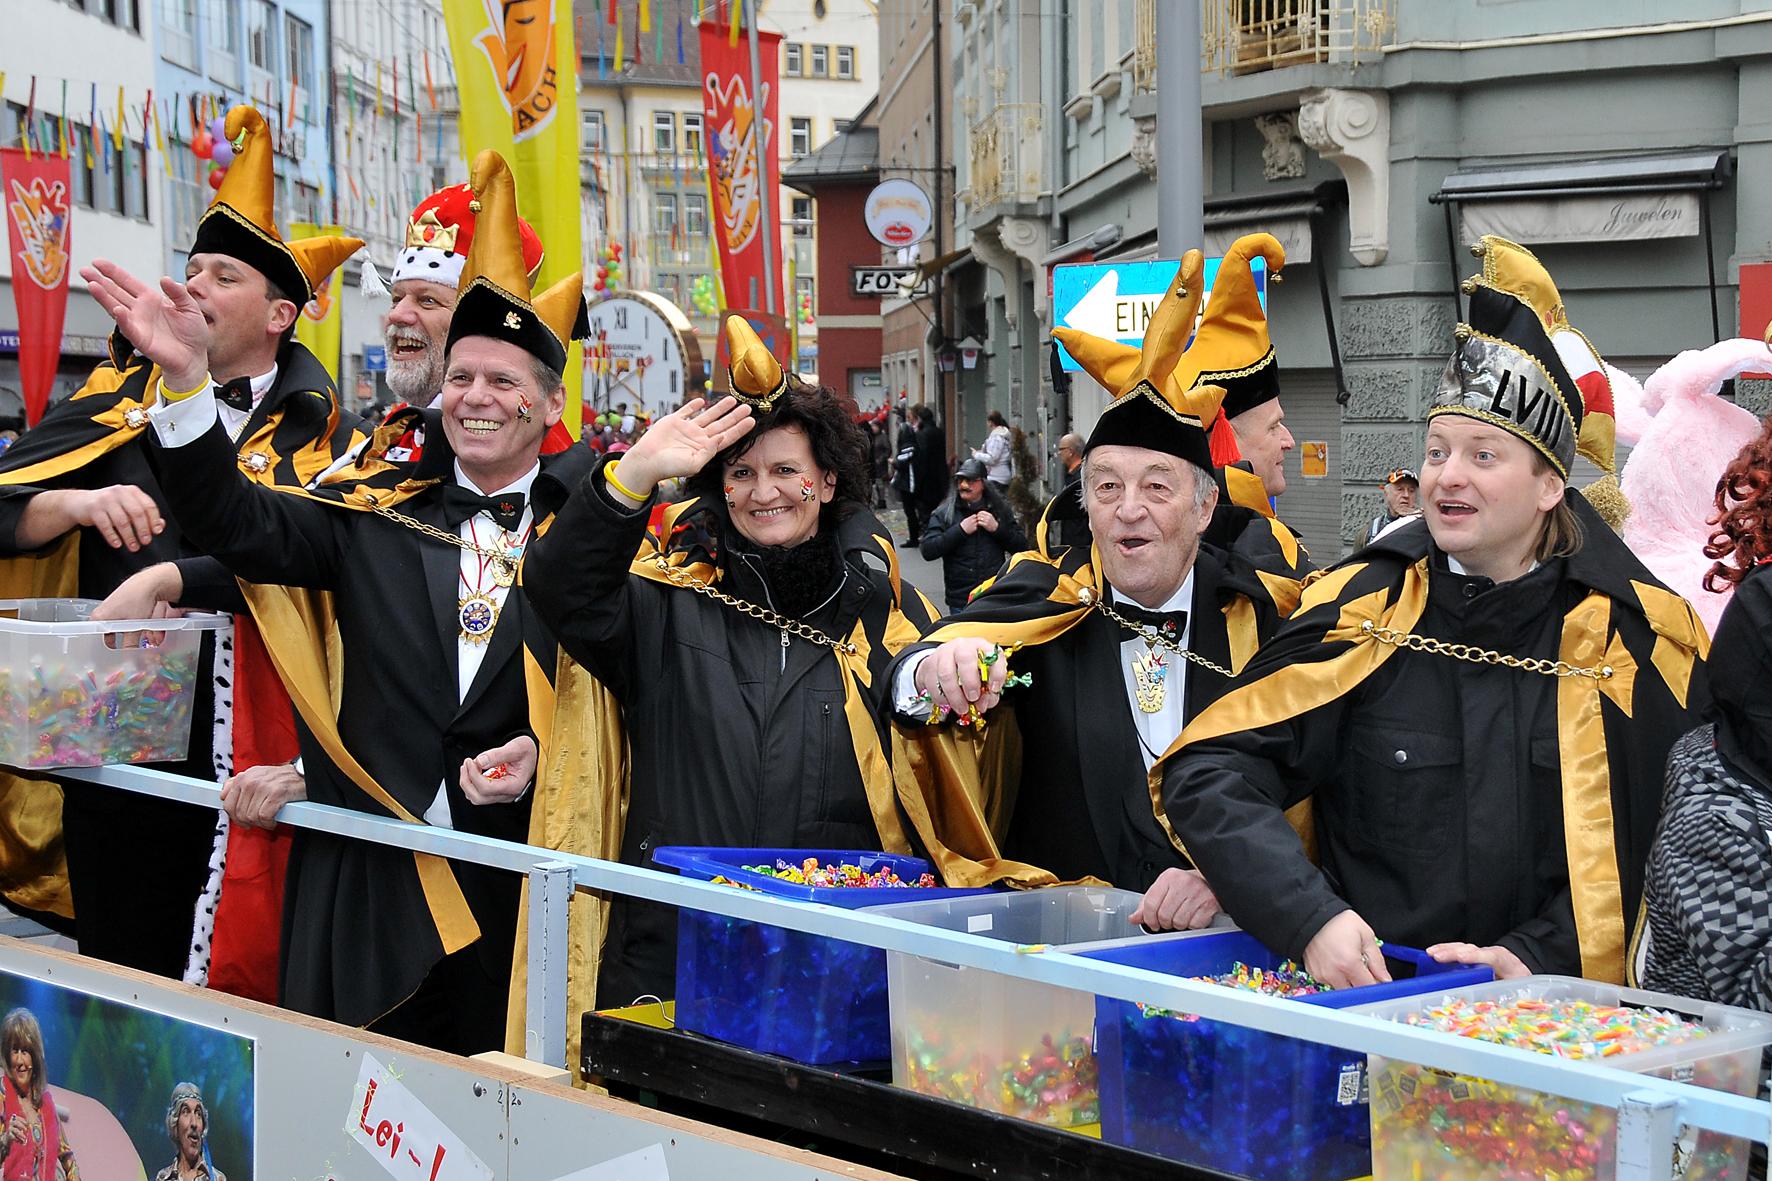 Date-e-programma-Carnevale-di-Villach-in-Austria